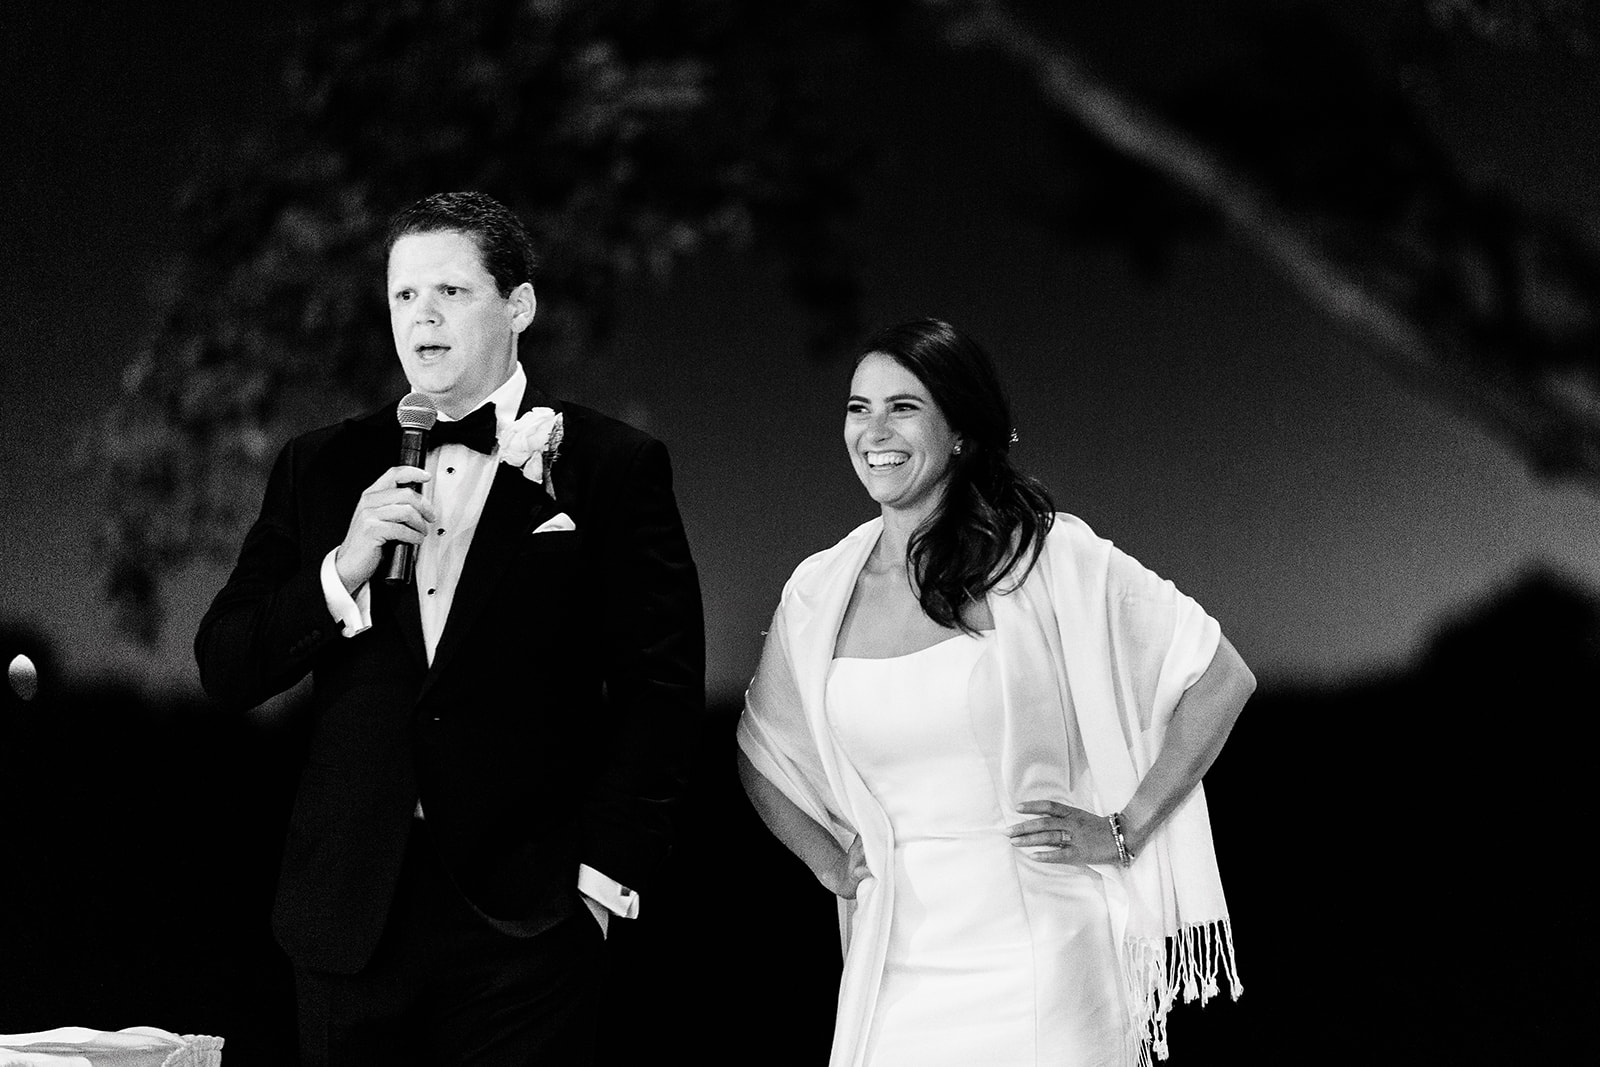 exmoor country club wedding_054.jpg